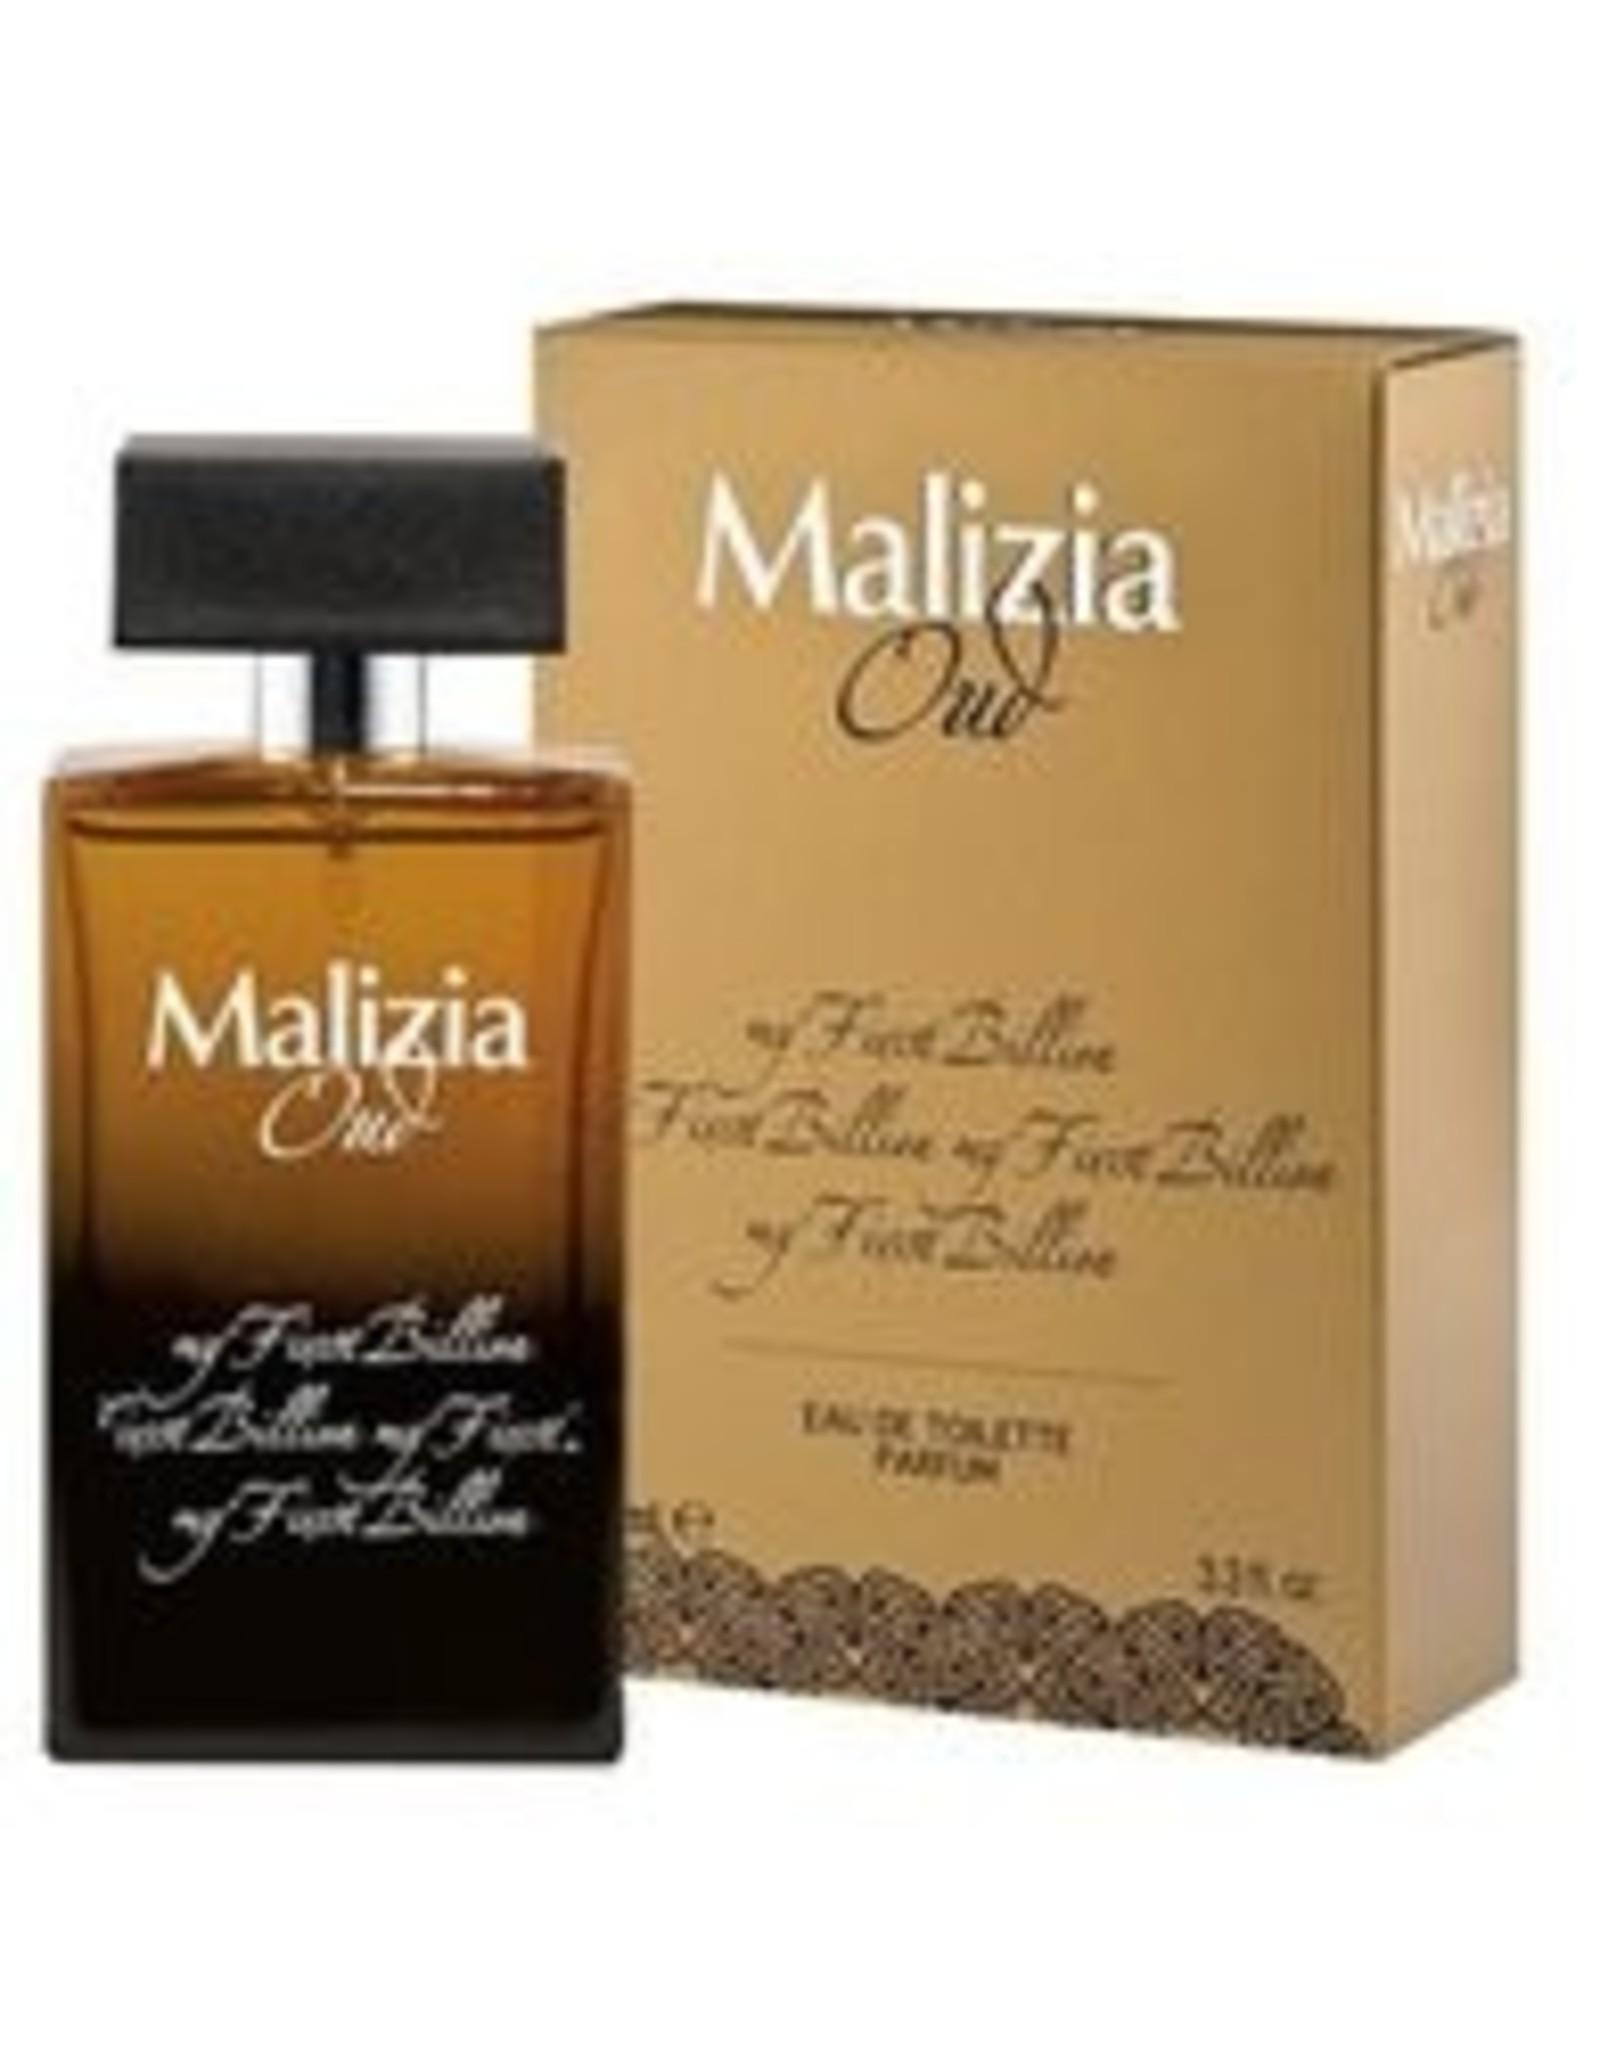 MALIZIA MALIZIA OUD MY FIRST BILLION